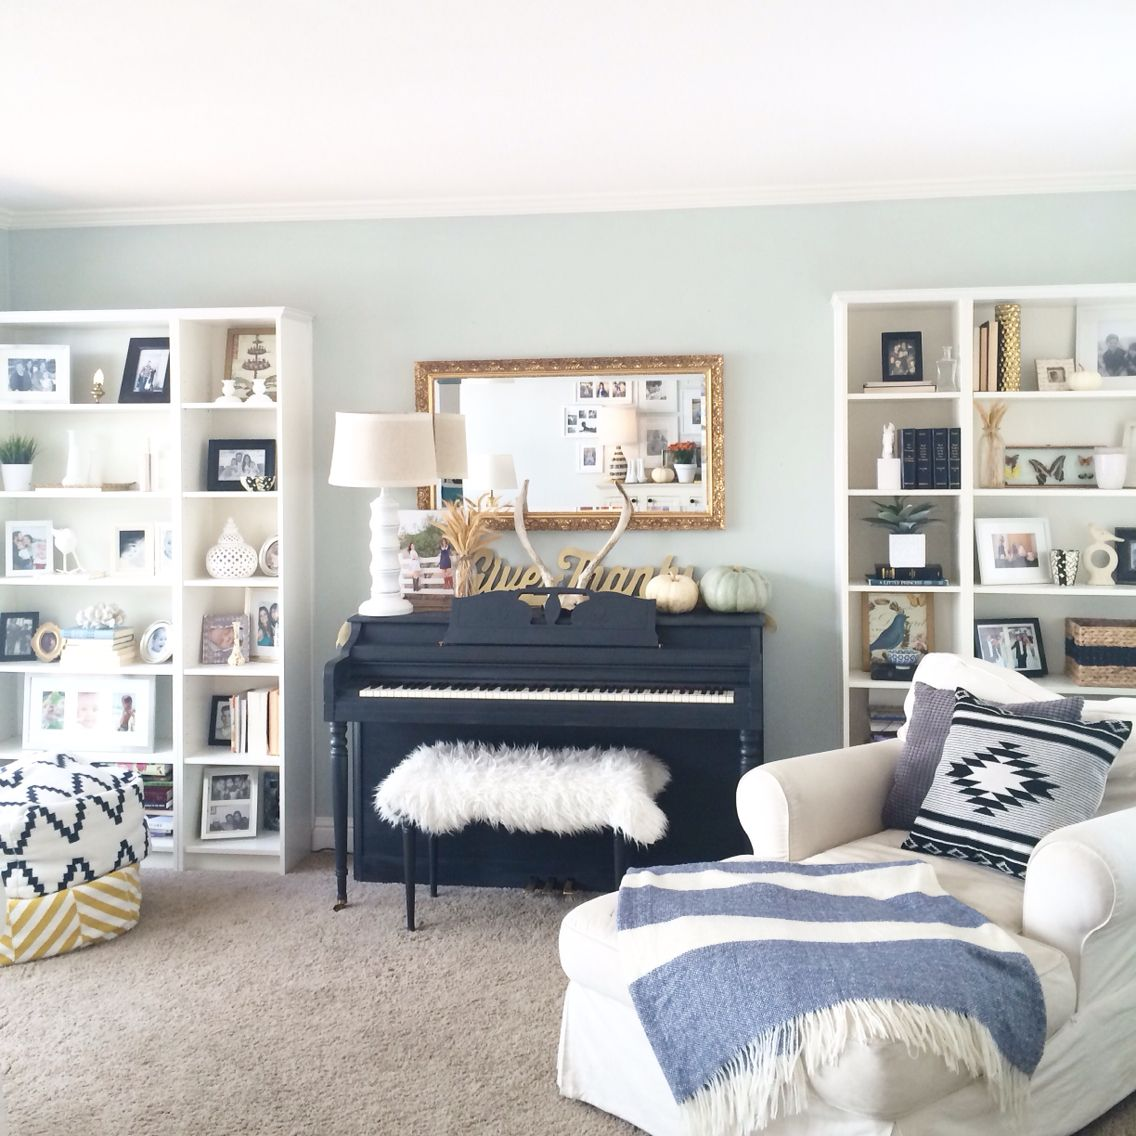 Painted Piano Bookshelves Living Room Poufs Sosimplydesign Piano Living Rooms Piano Room Decor Piano Room Design Living room ideas piano